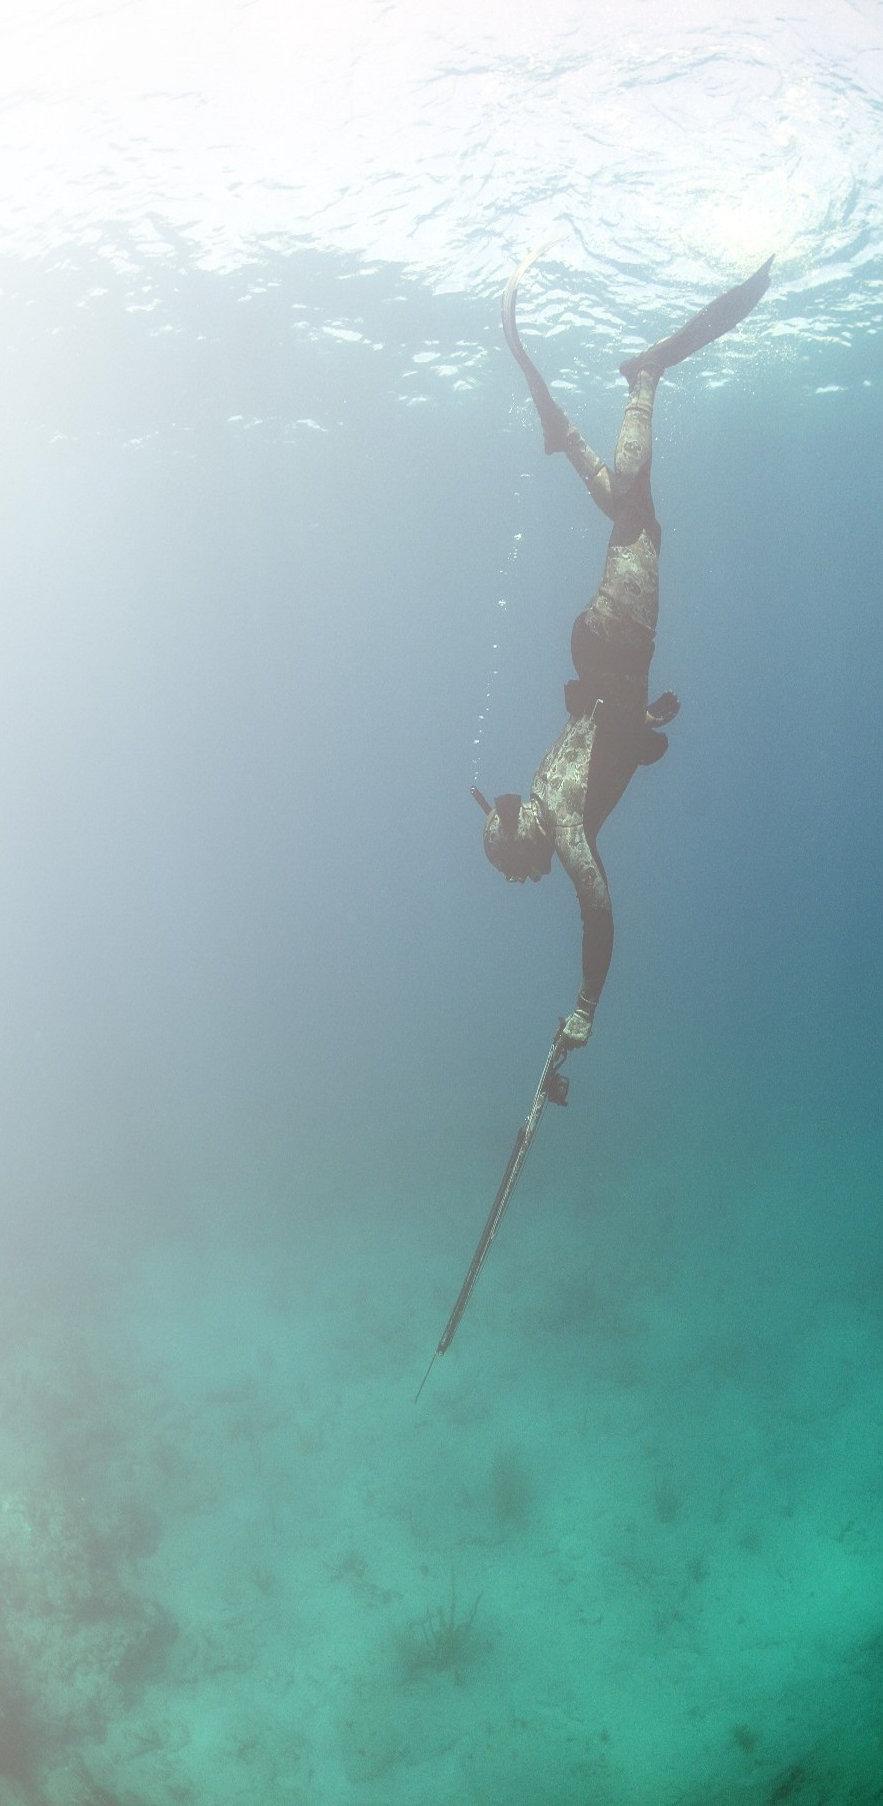 Spearfishing | White River Dive Company - Branson, Missouri